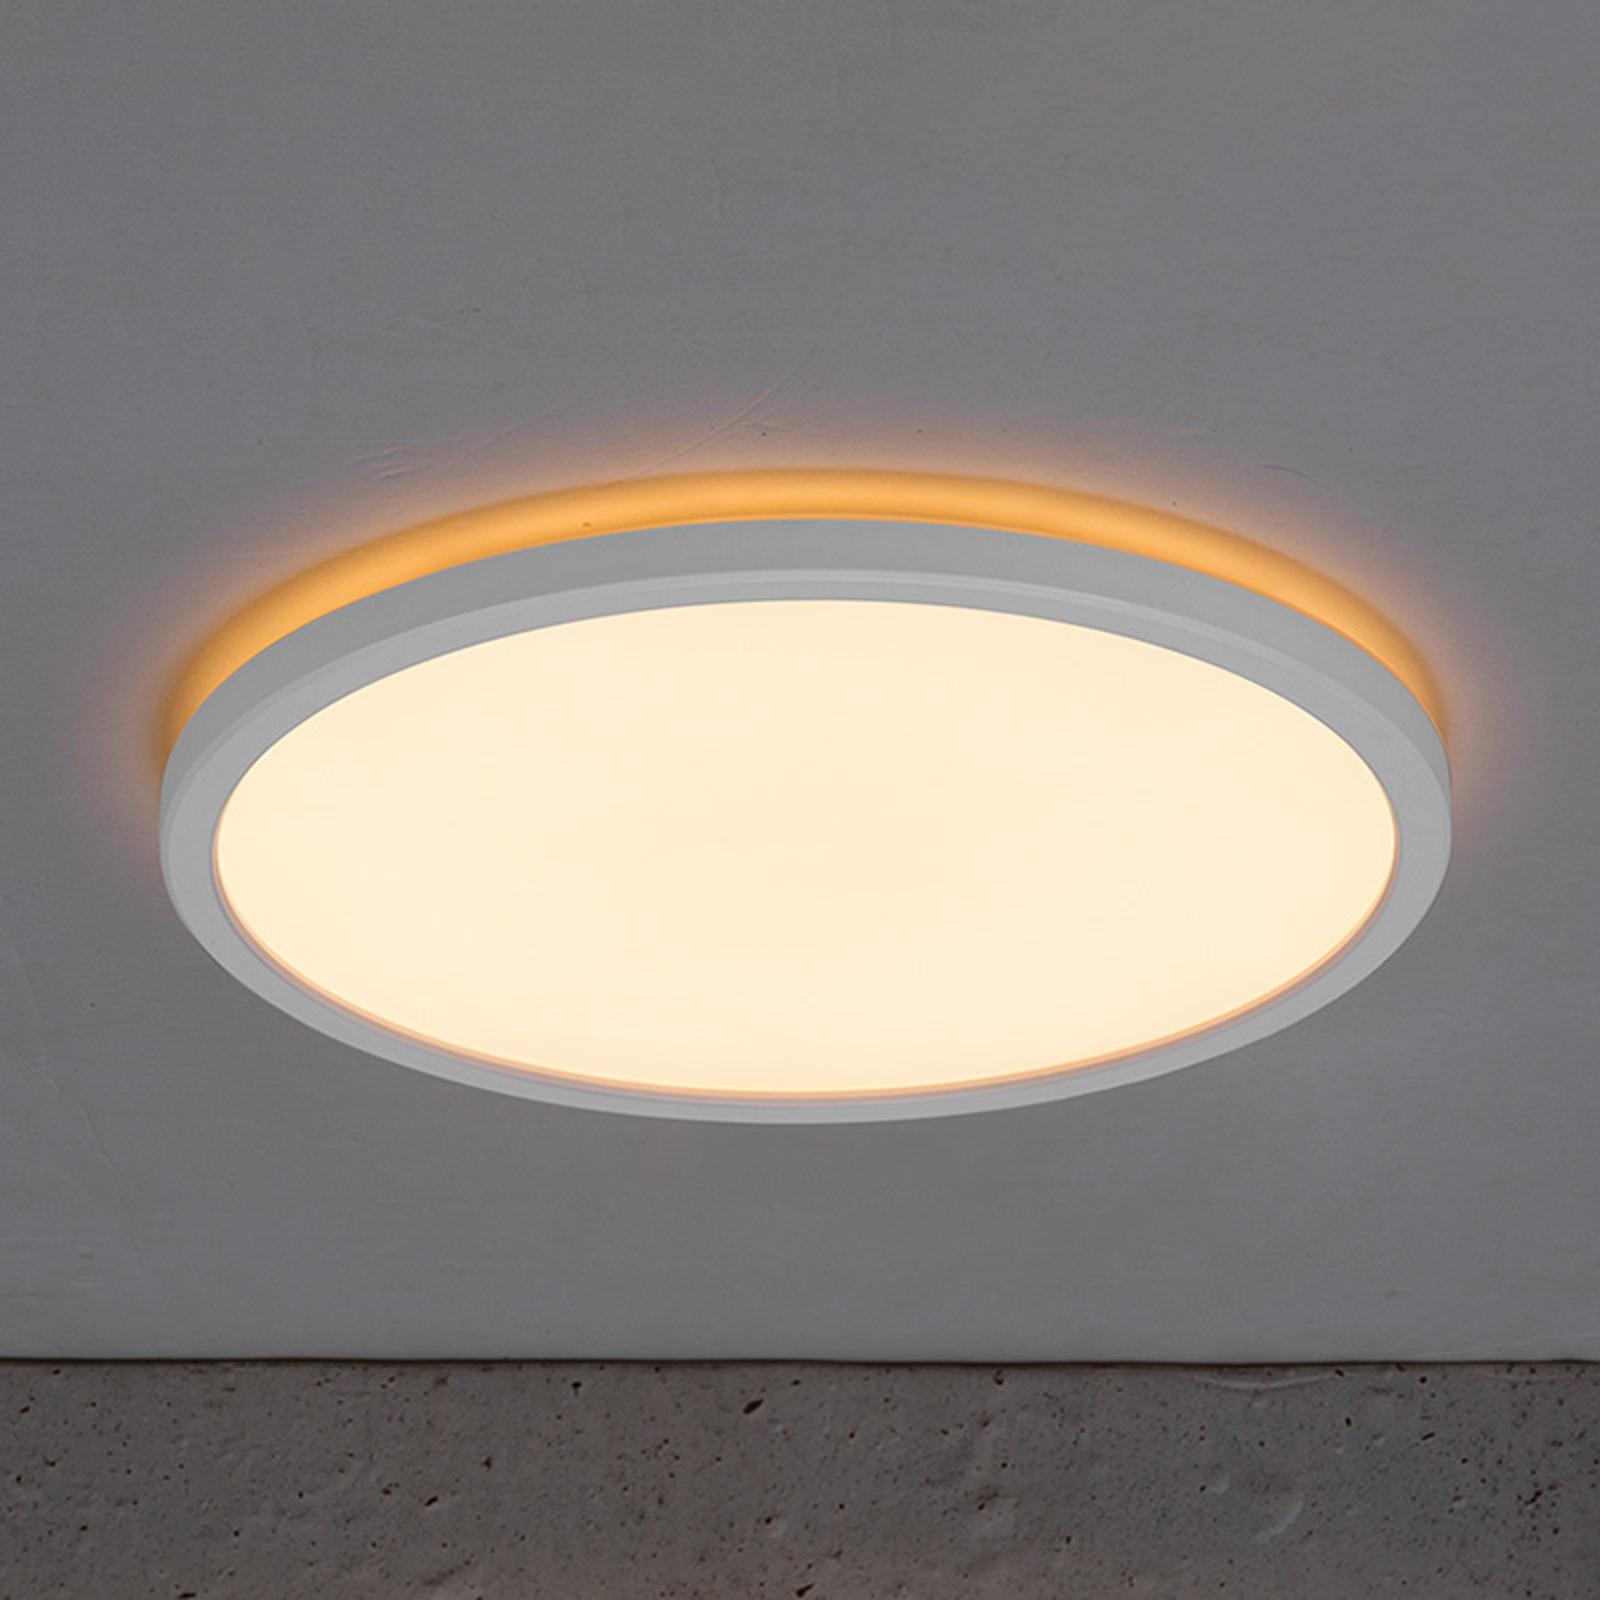 LED-taklampe Bronx 2700K, Ø 29 cm